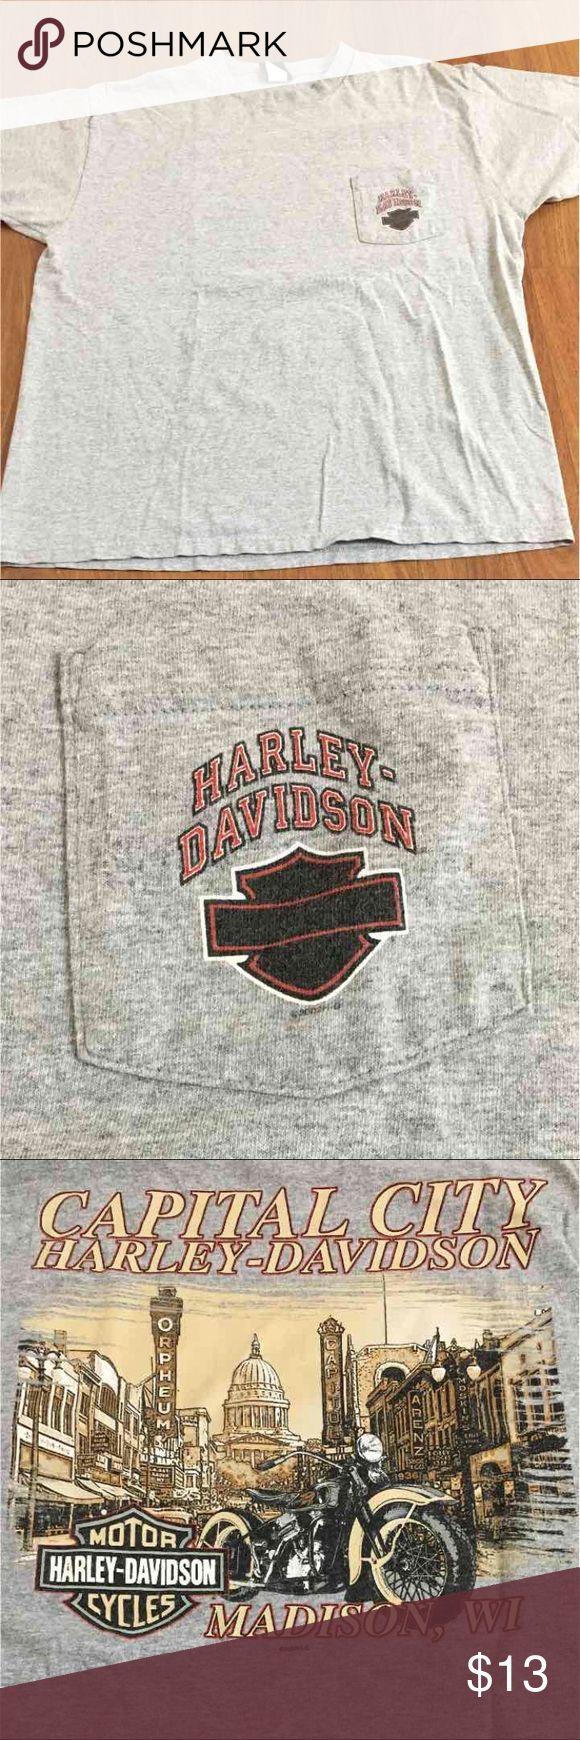 Men's Harley Davidson shirt 2XL Men's gray Harley Davidson t shirt with front pocket. Has design on the back. In great condition Harley-Davidson Shirts Tees - Short Sleeve